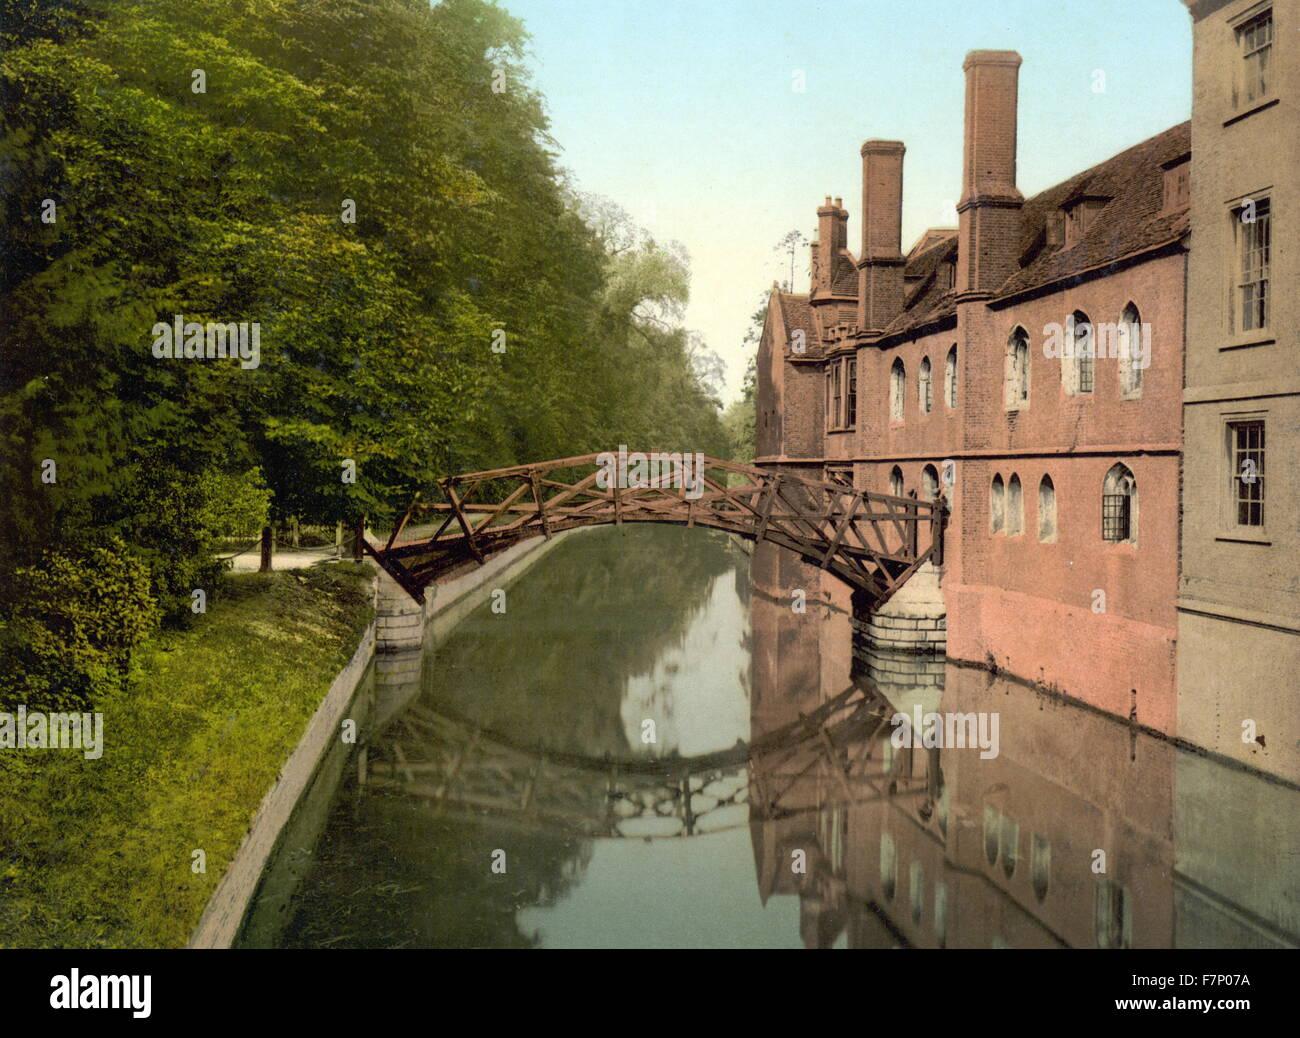 Queen's College Bridge, Cambridge, England 1890 - Stock Image